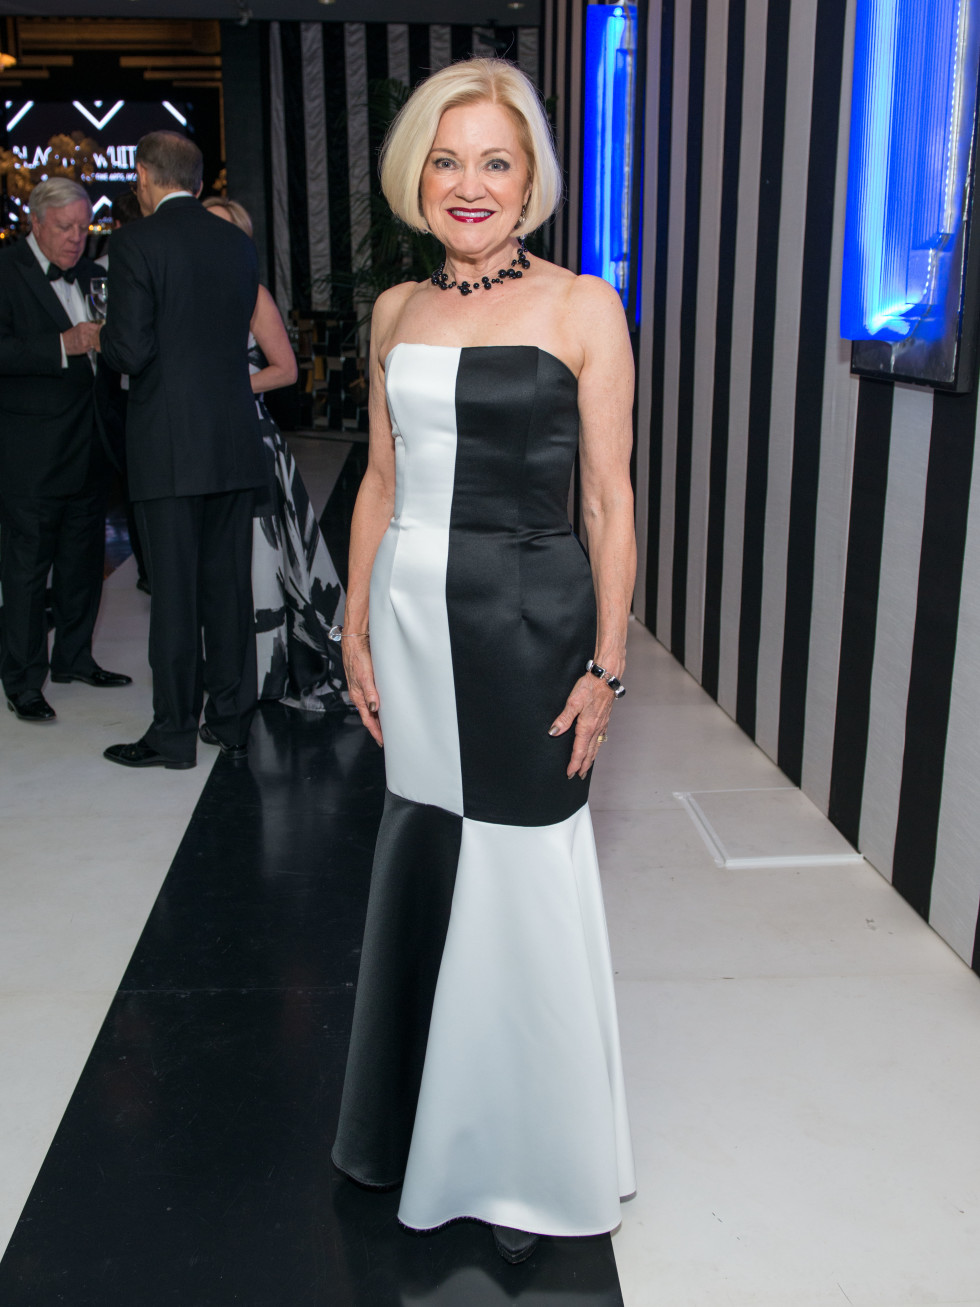 News, Shelby, MFAH gala gowns, Oct. 2015 Jo Furr in Jessica McClintock